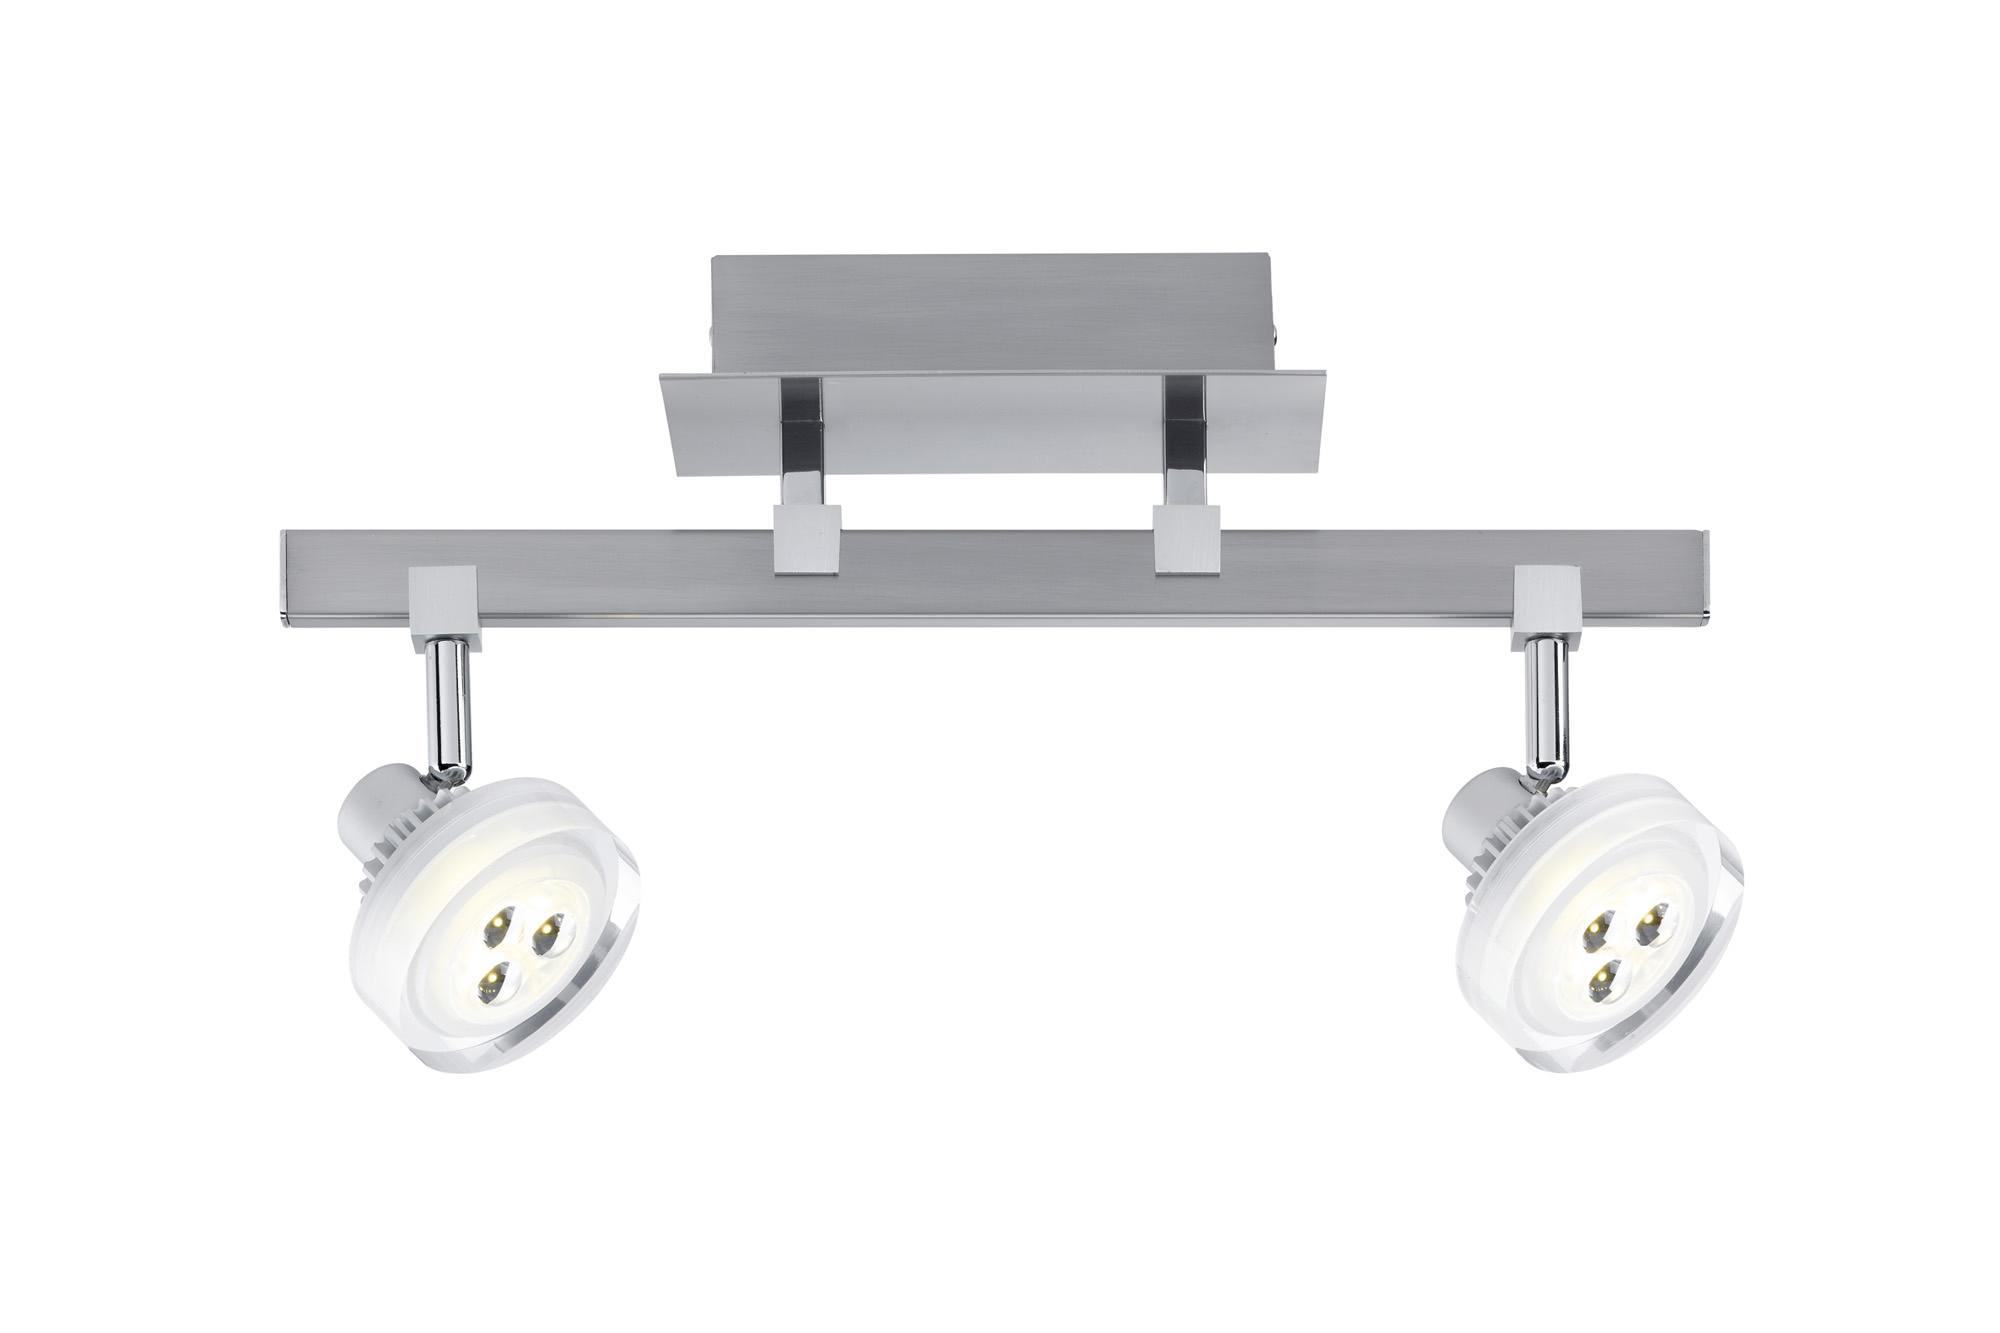 Paulmann. 60196 Светильник Gloria LED 2x 5 W, 230/12 V, 3000 K/ 2x 186 lm, никель тертый